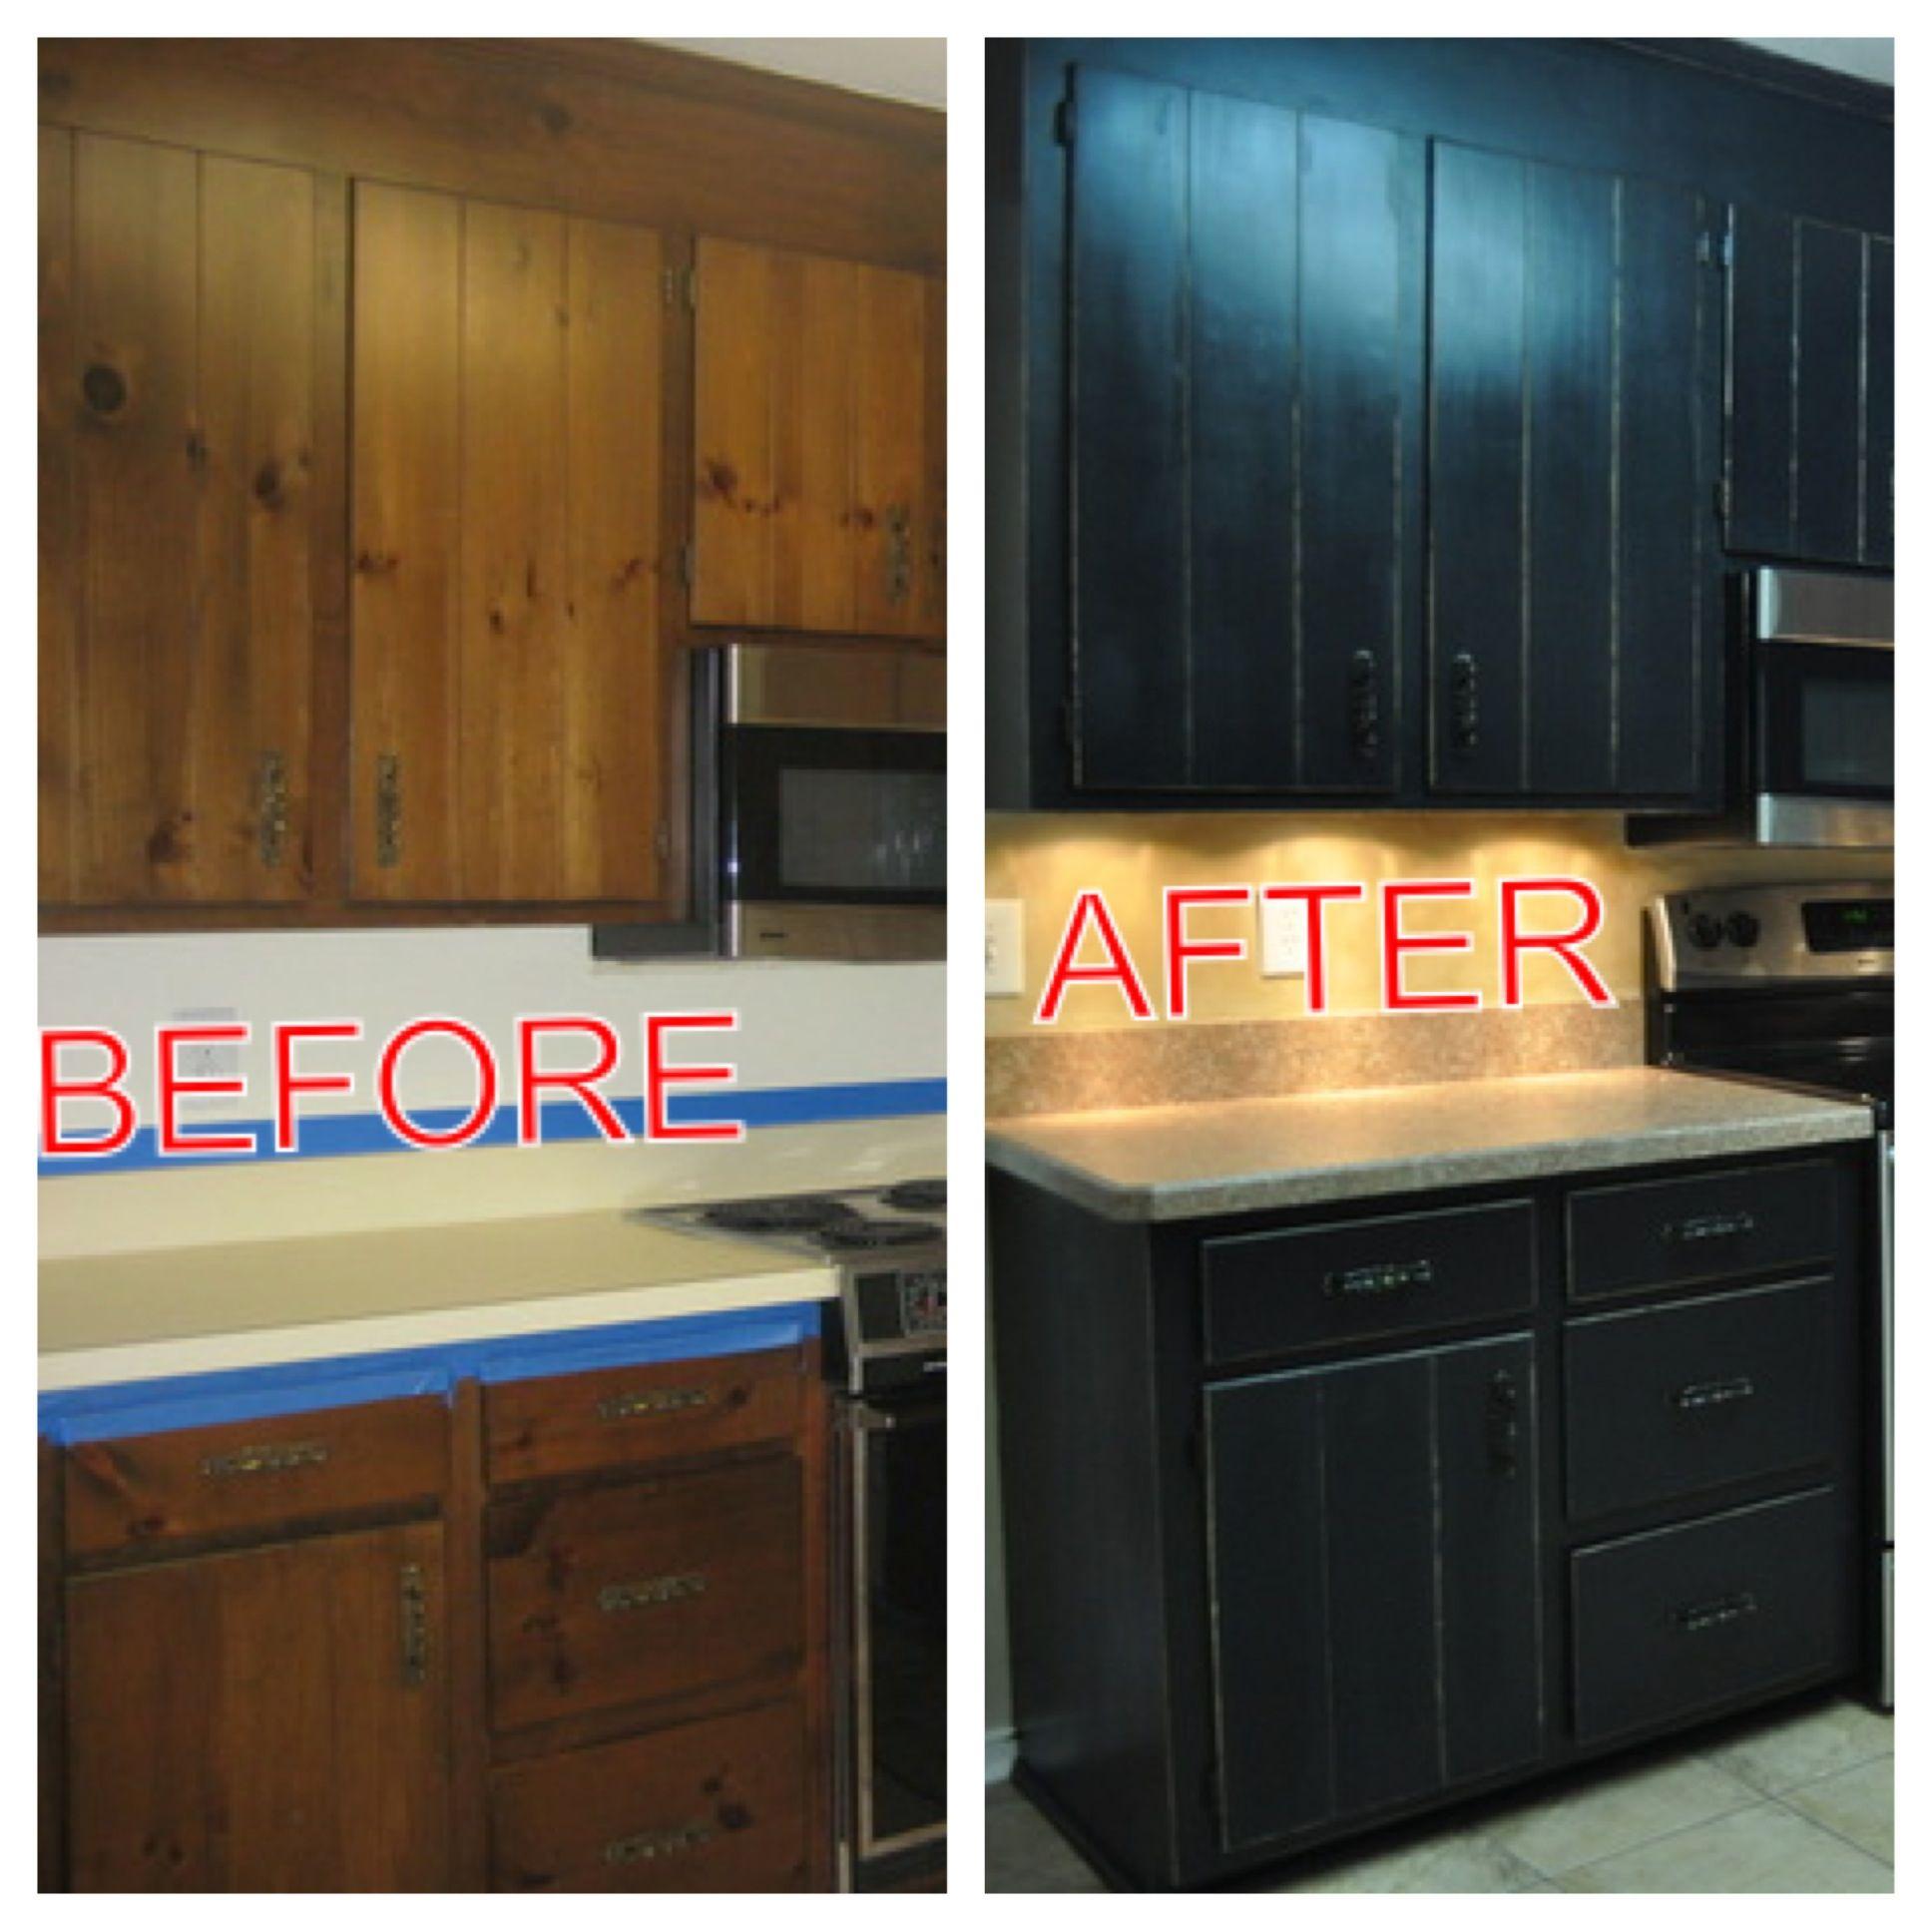 Redone Kitchen Cabinets: Redo Kitchen Cabinets